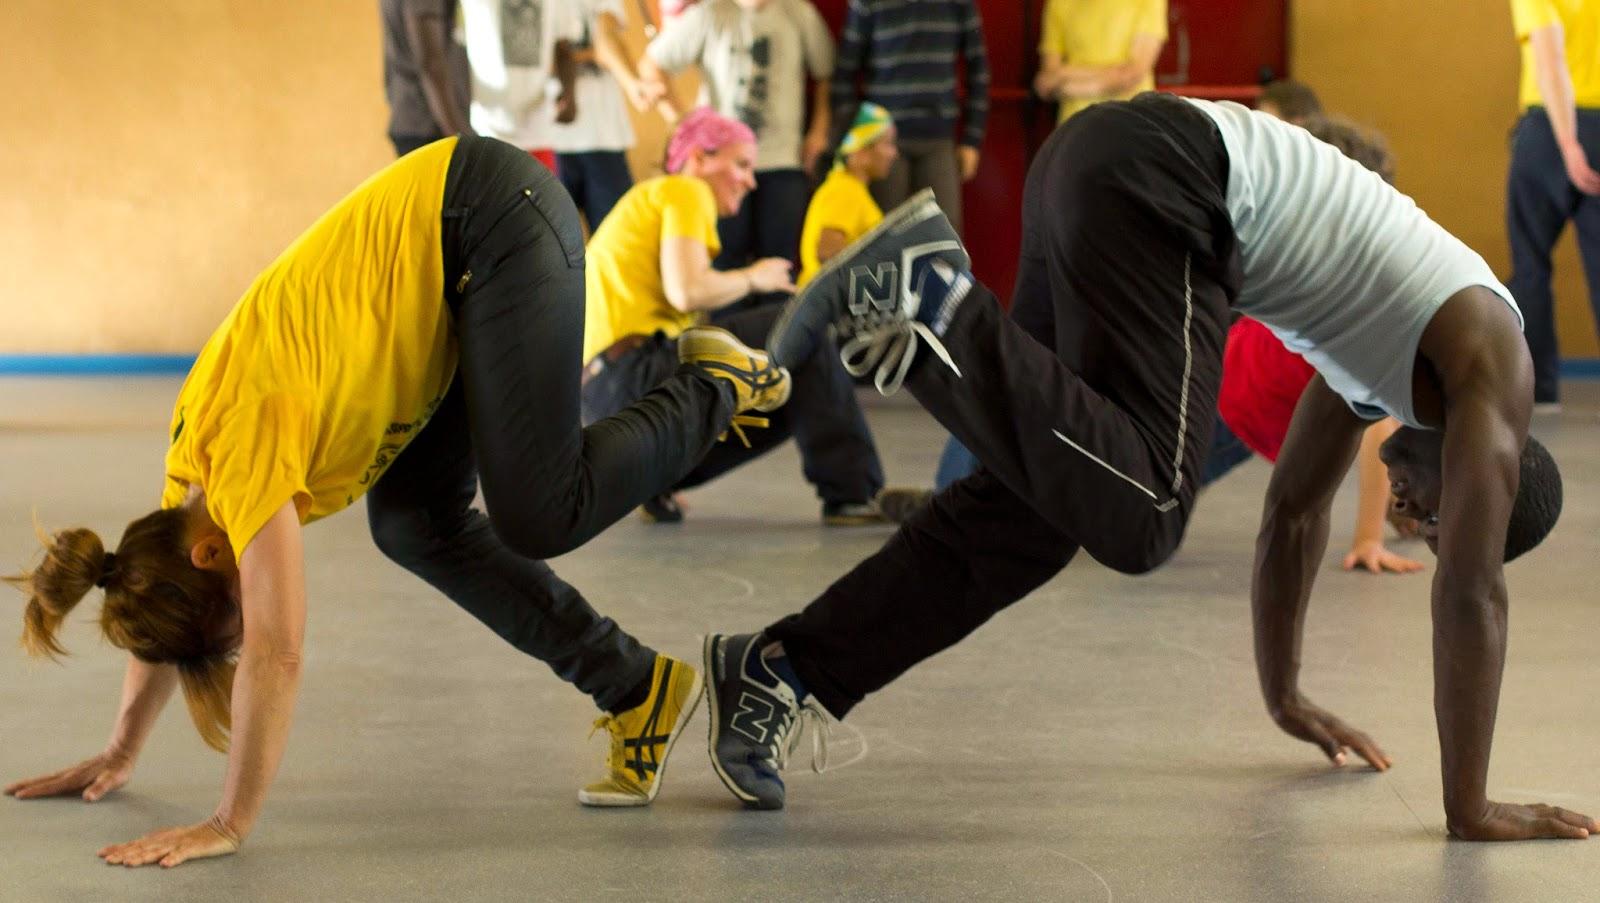 Movimientos-de-capoeira-4